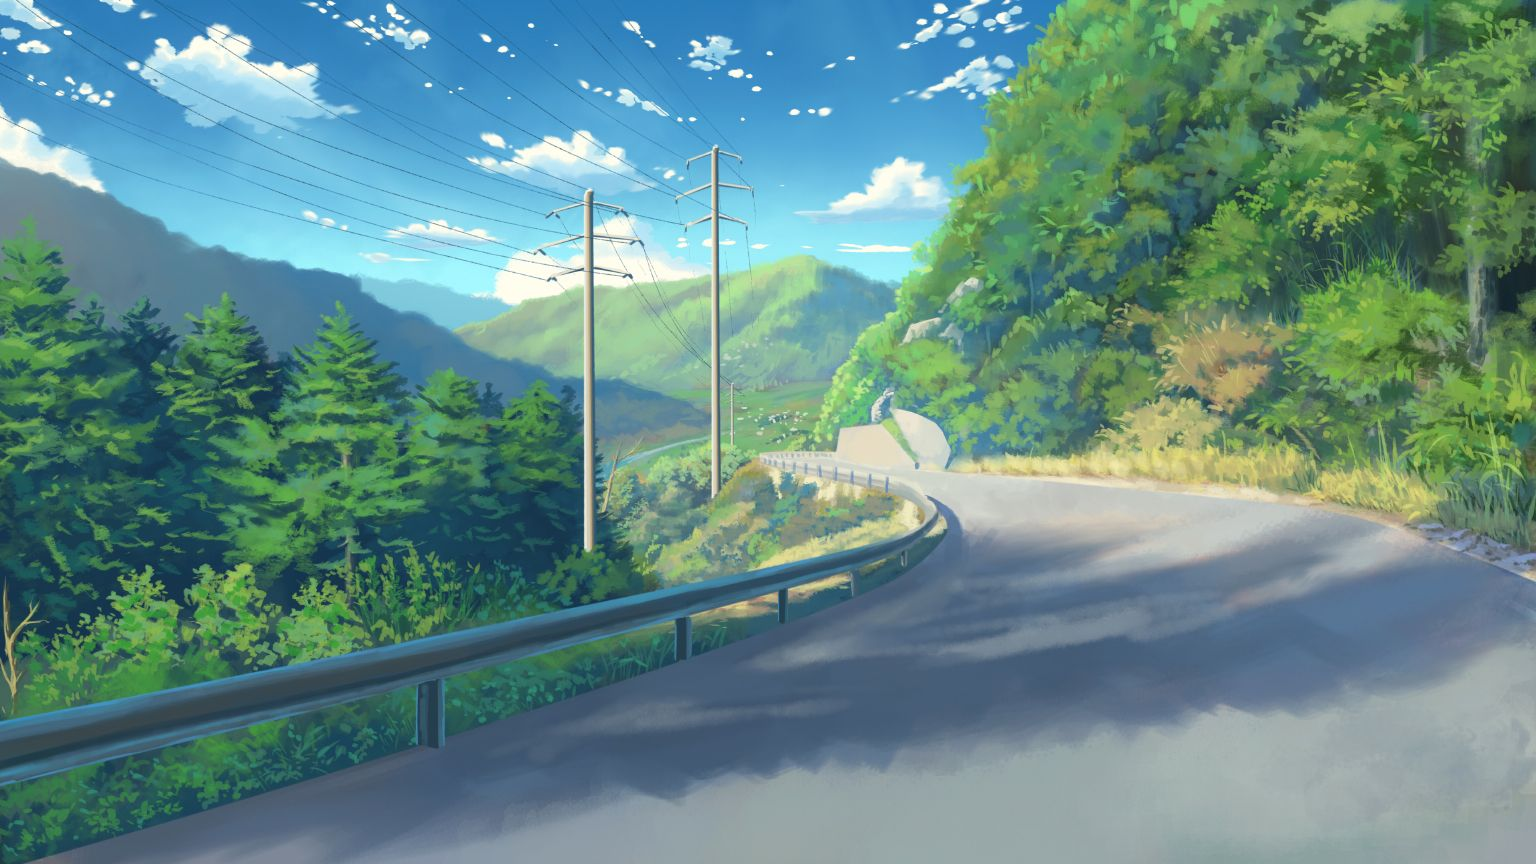 Pixiv Id 952566 Wallpaper 2174202 Zerochan Cenario Anime Wallpaper Paisagem Fotos De Paisagem